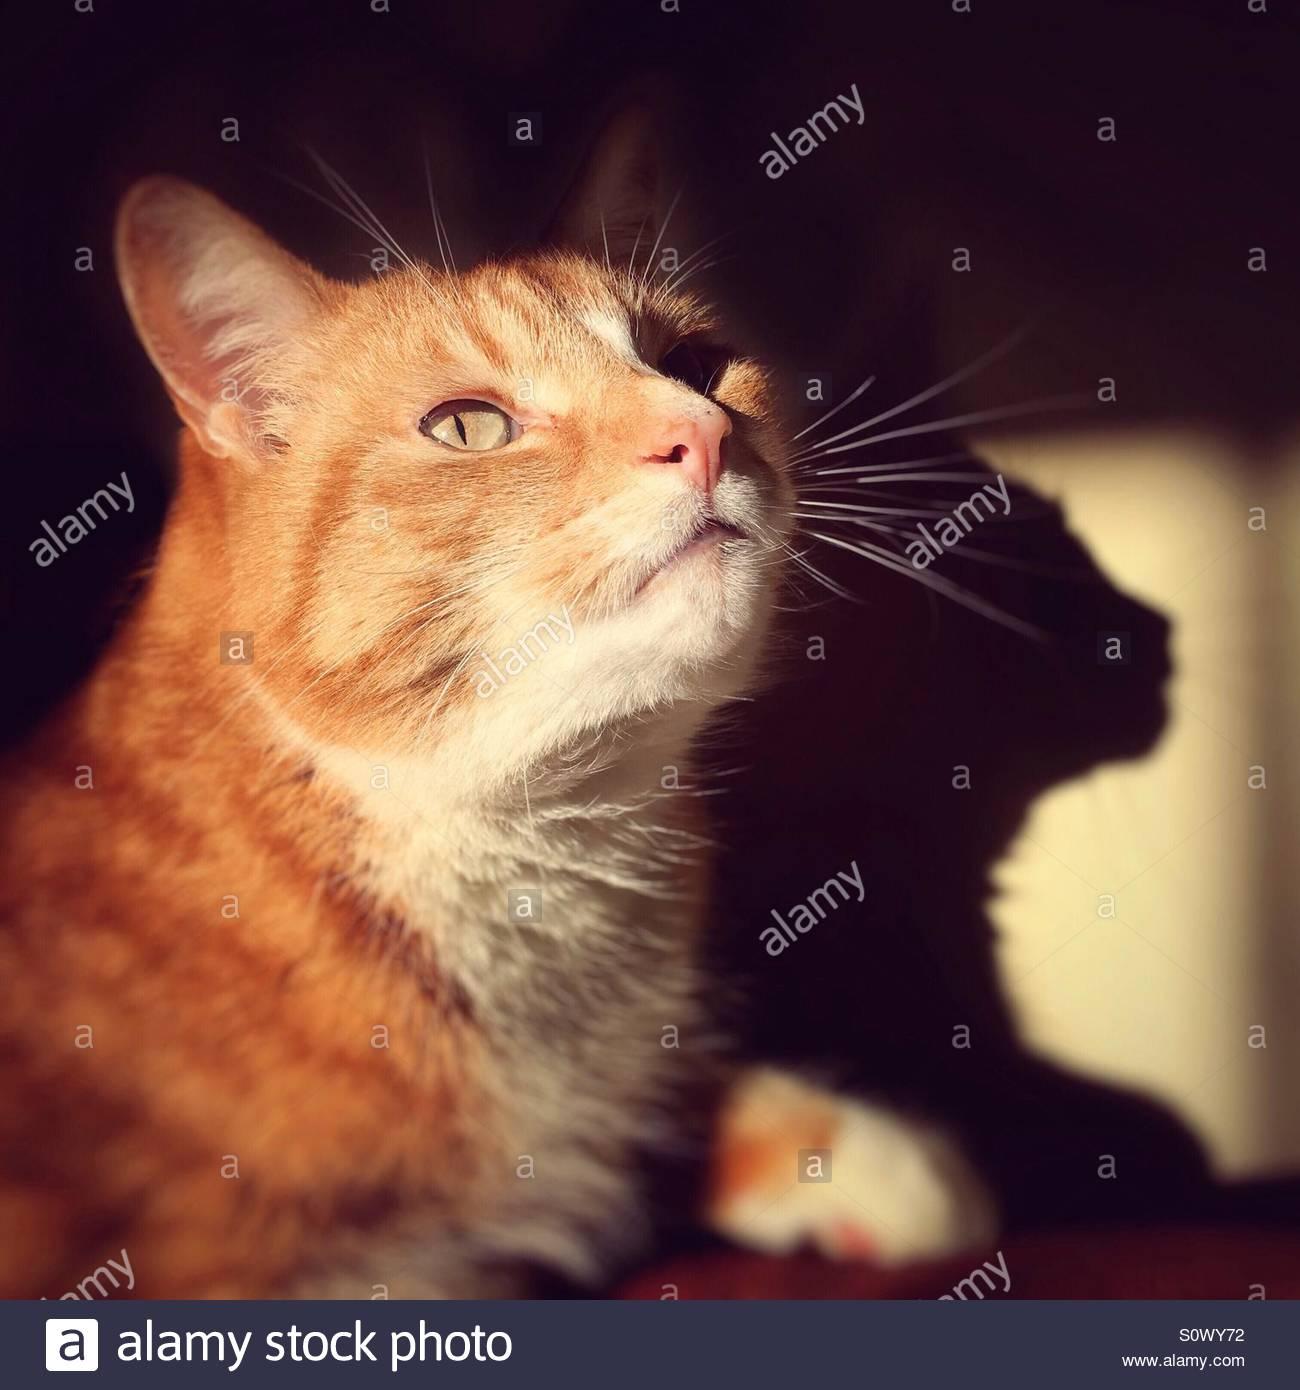 Cat Portrait - Stock Image